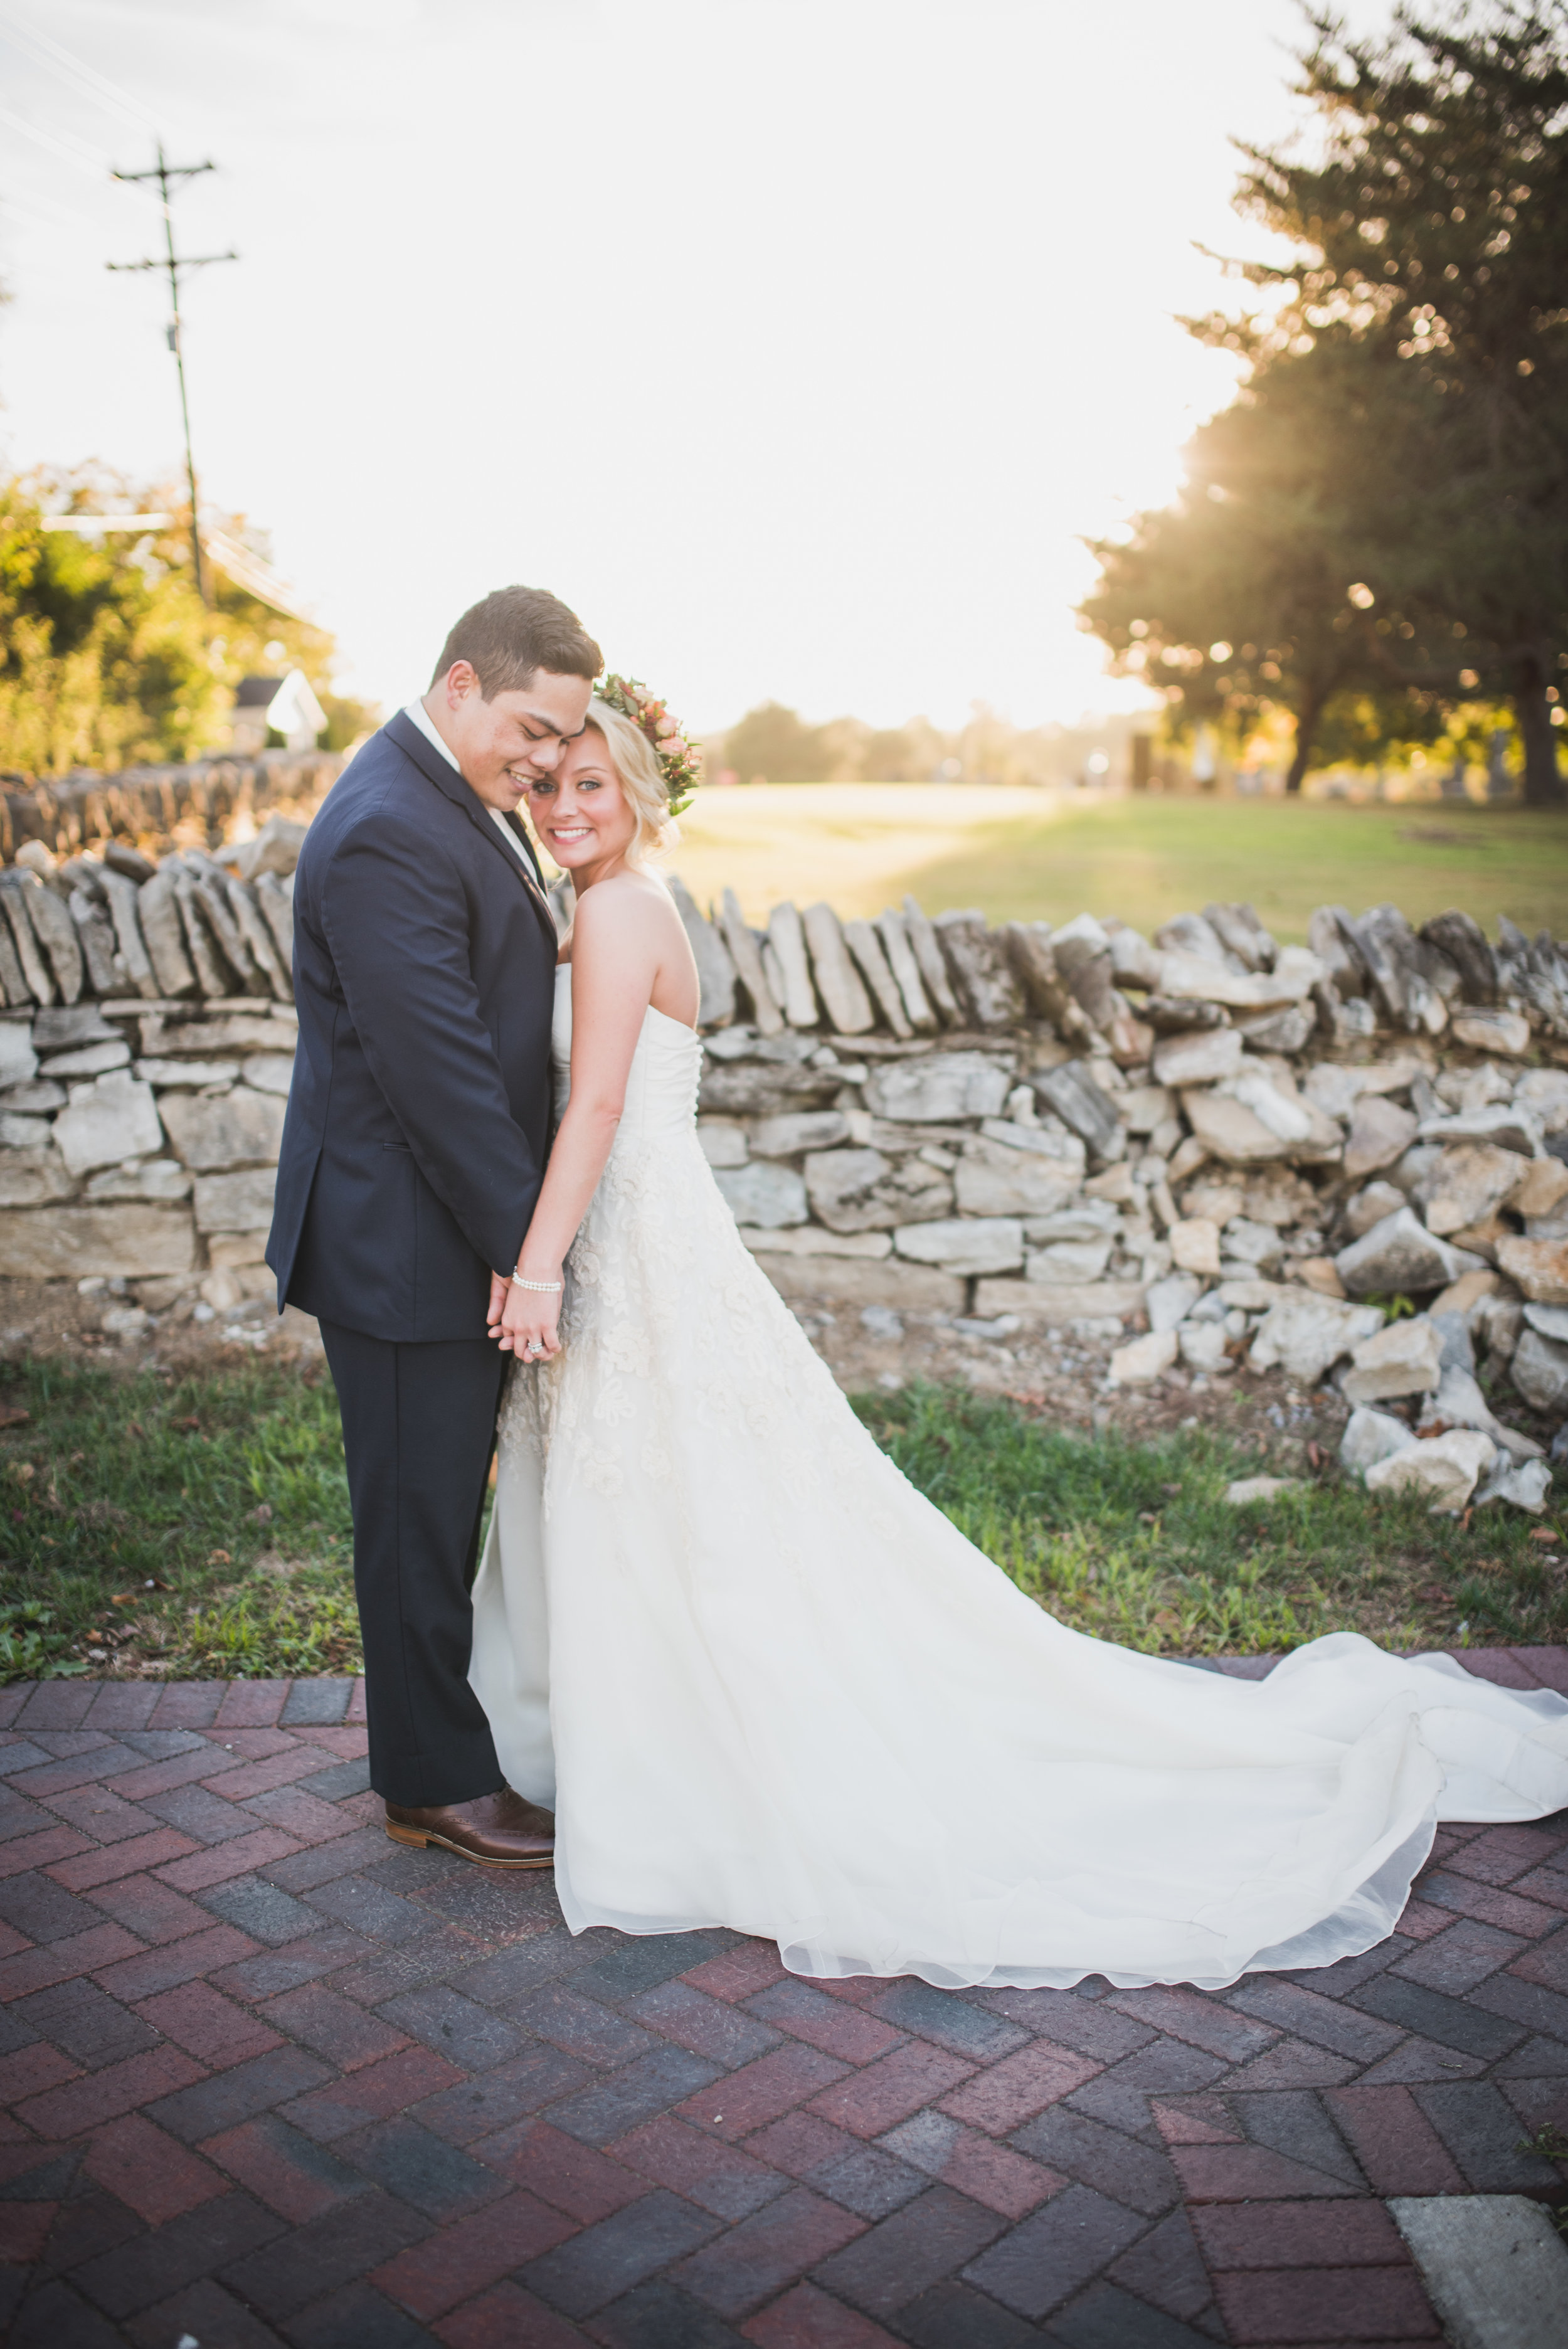 Nashville-wedding-photographers-CJ's-Off-The-Square-47.JPG